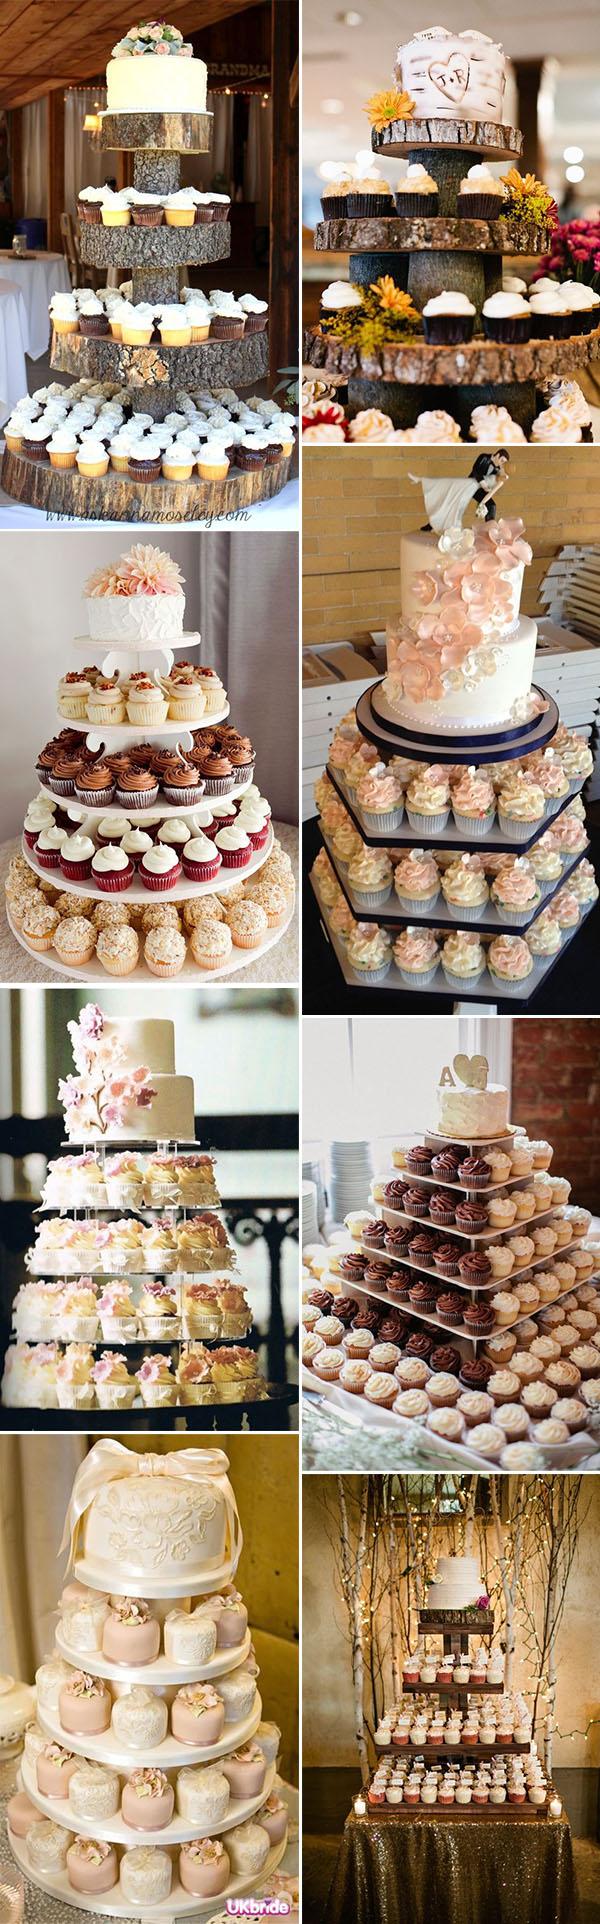 25 Fabulous Wedding Cake Ideas With Pearls Elegantweddinginvites